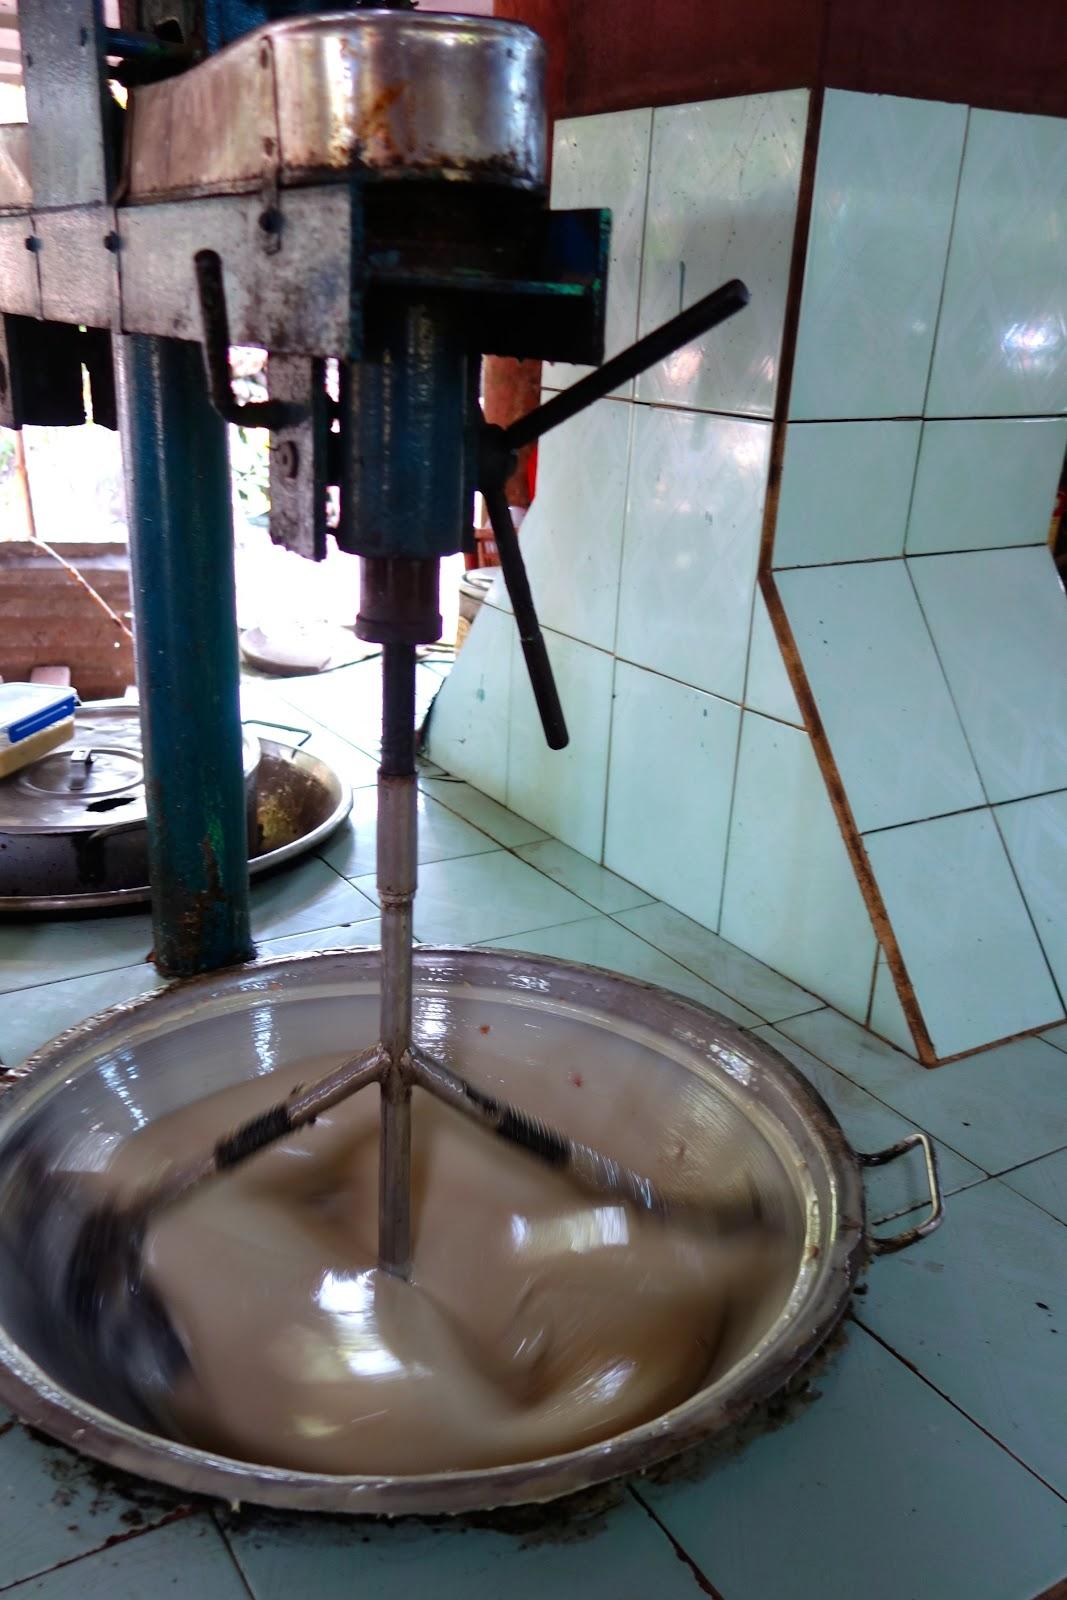 Coconut candy factory Mekong Delta Vietnam 2015